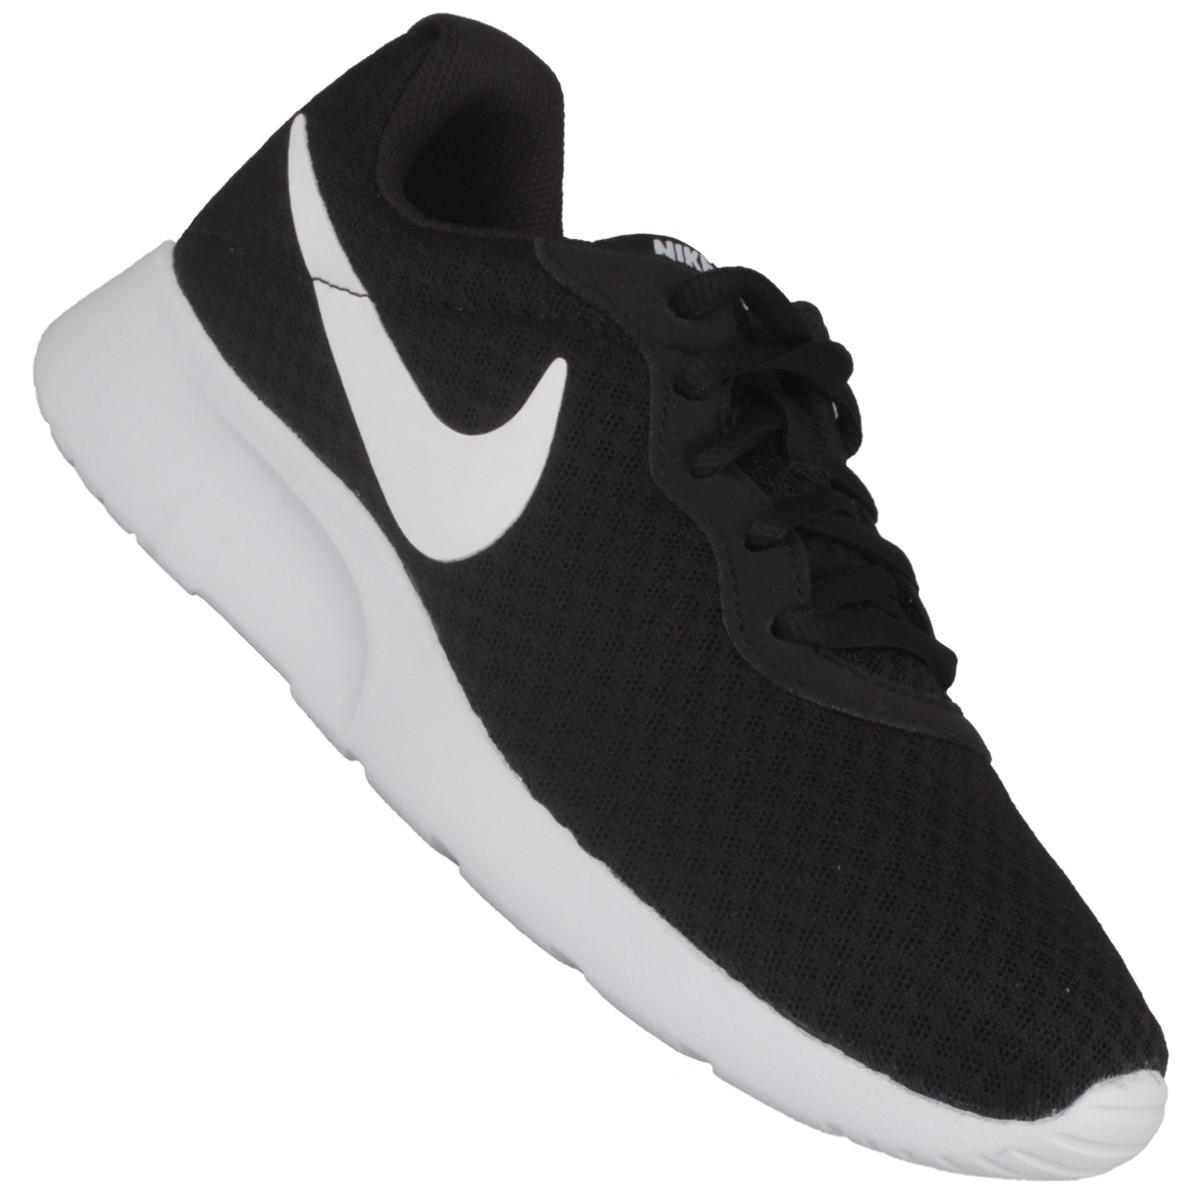 4e8b99b7fc5 Tênis Nike Wmns Tanjun